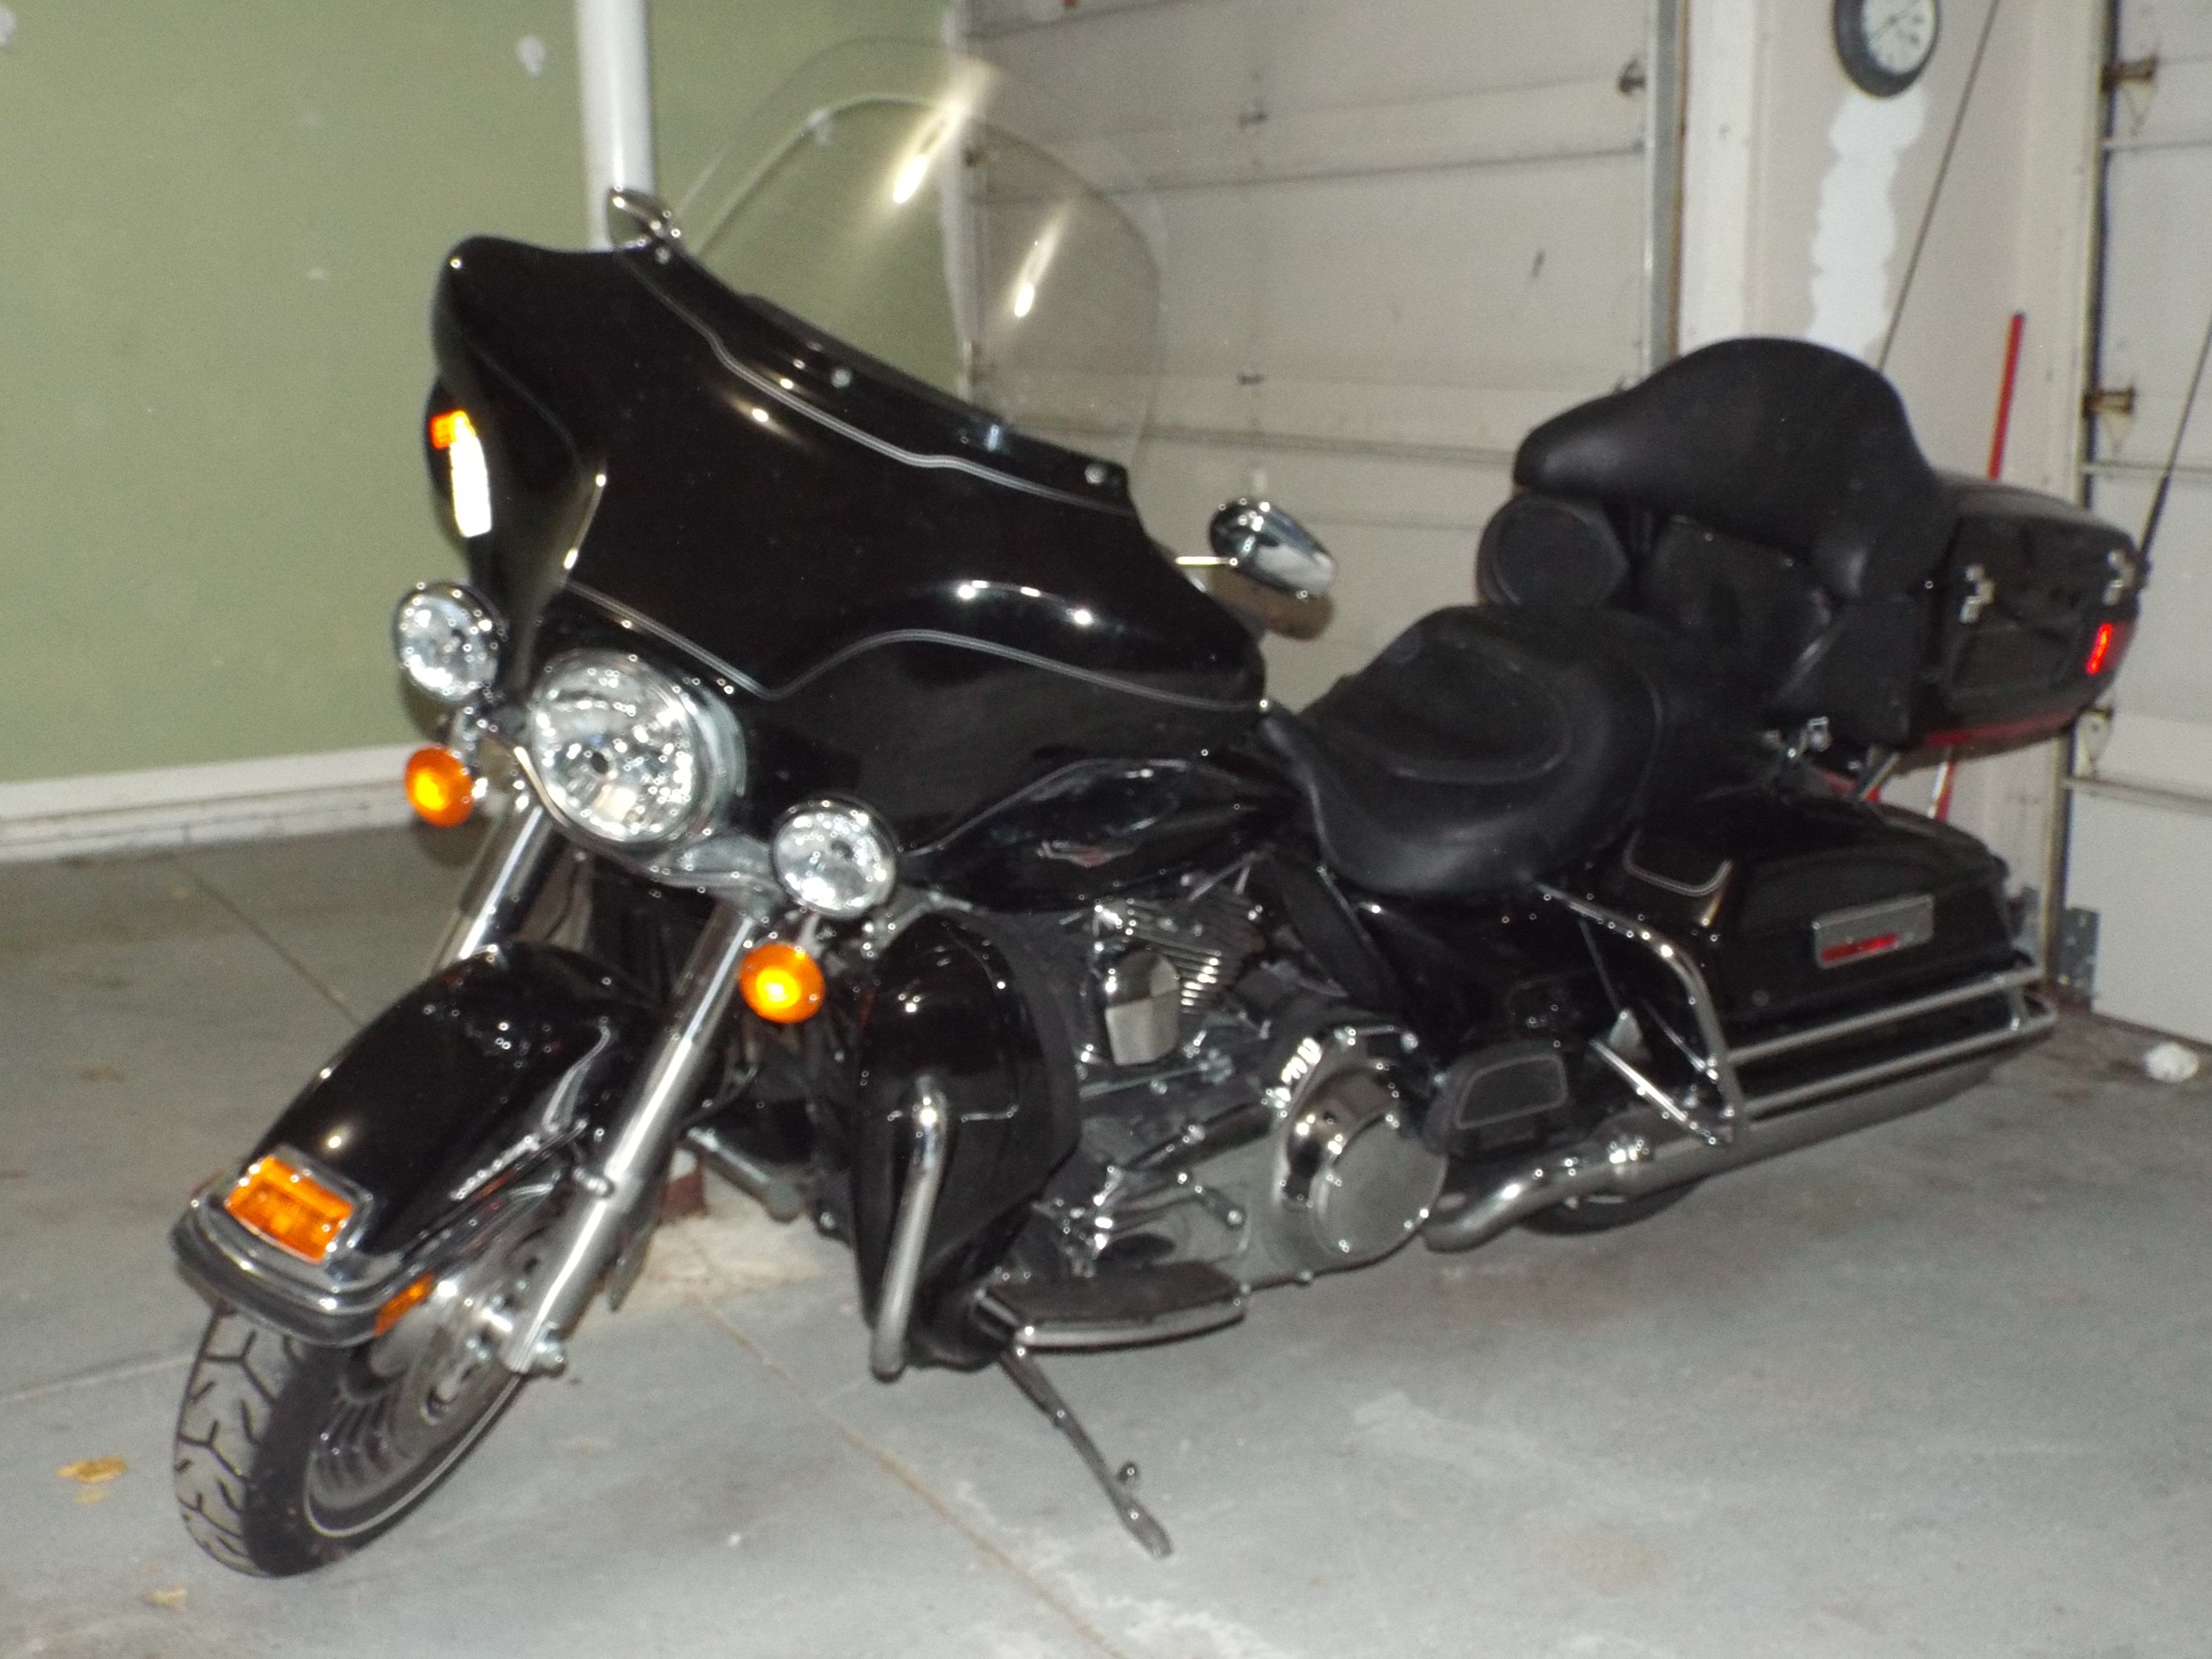 Harley Davidson Electra Glide For Sale Tulsa Ok >> 2010 Harley-Davidson® FLHTCU Ultra Classic® Electra Glide® (Black), Omaha, Nebraska (565539 ...